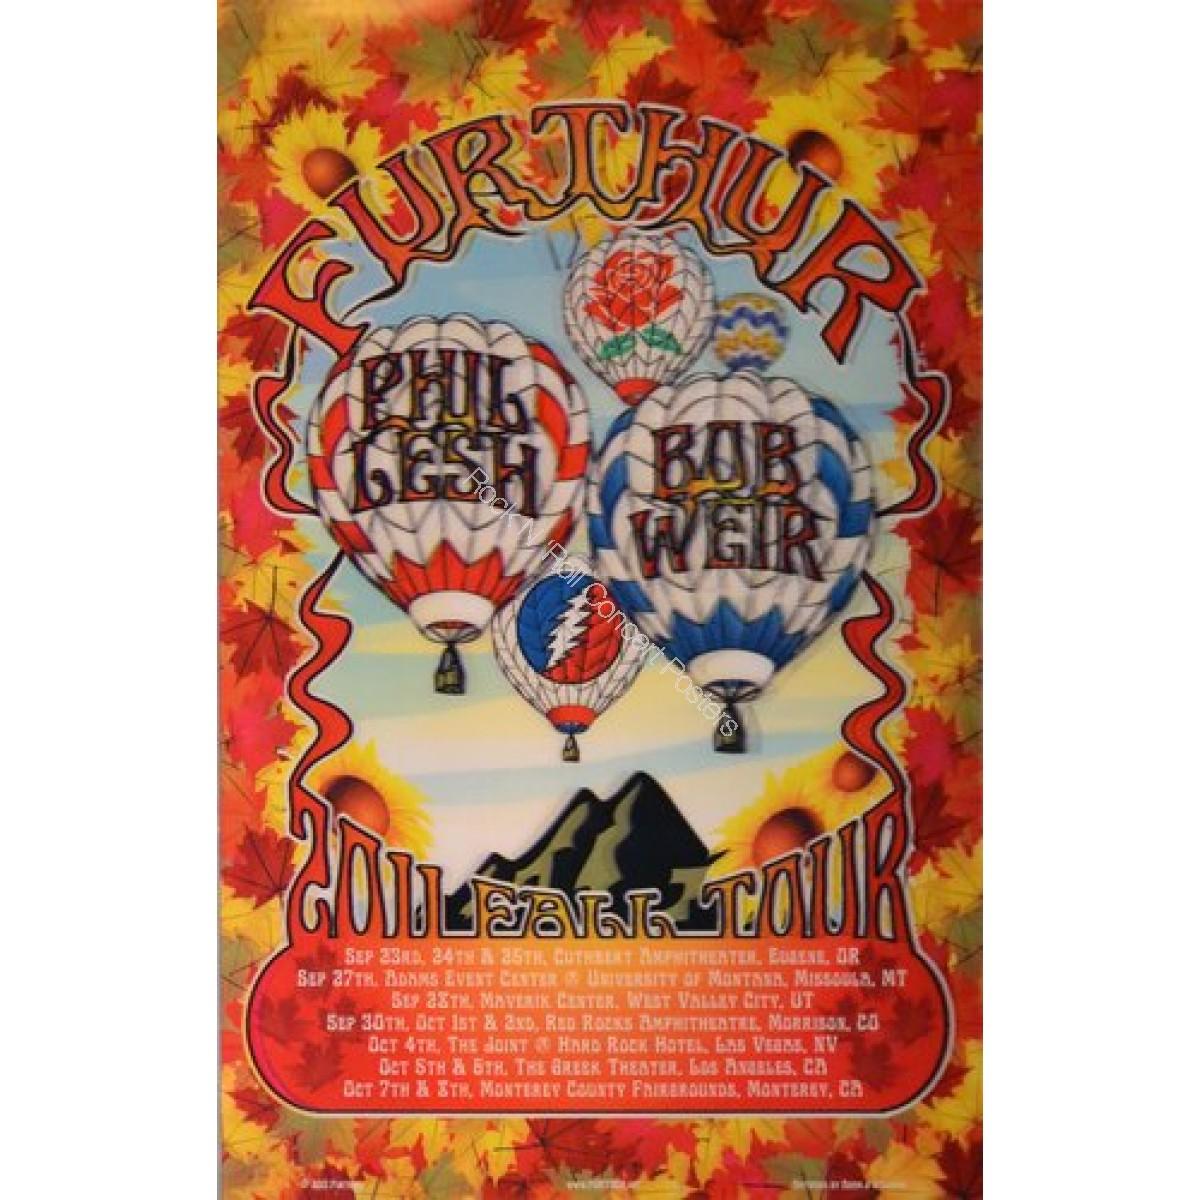 Furthur West Coast Tour 2011 lenticular print